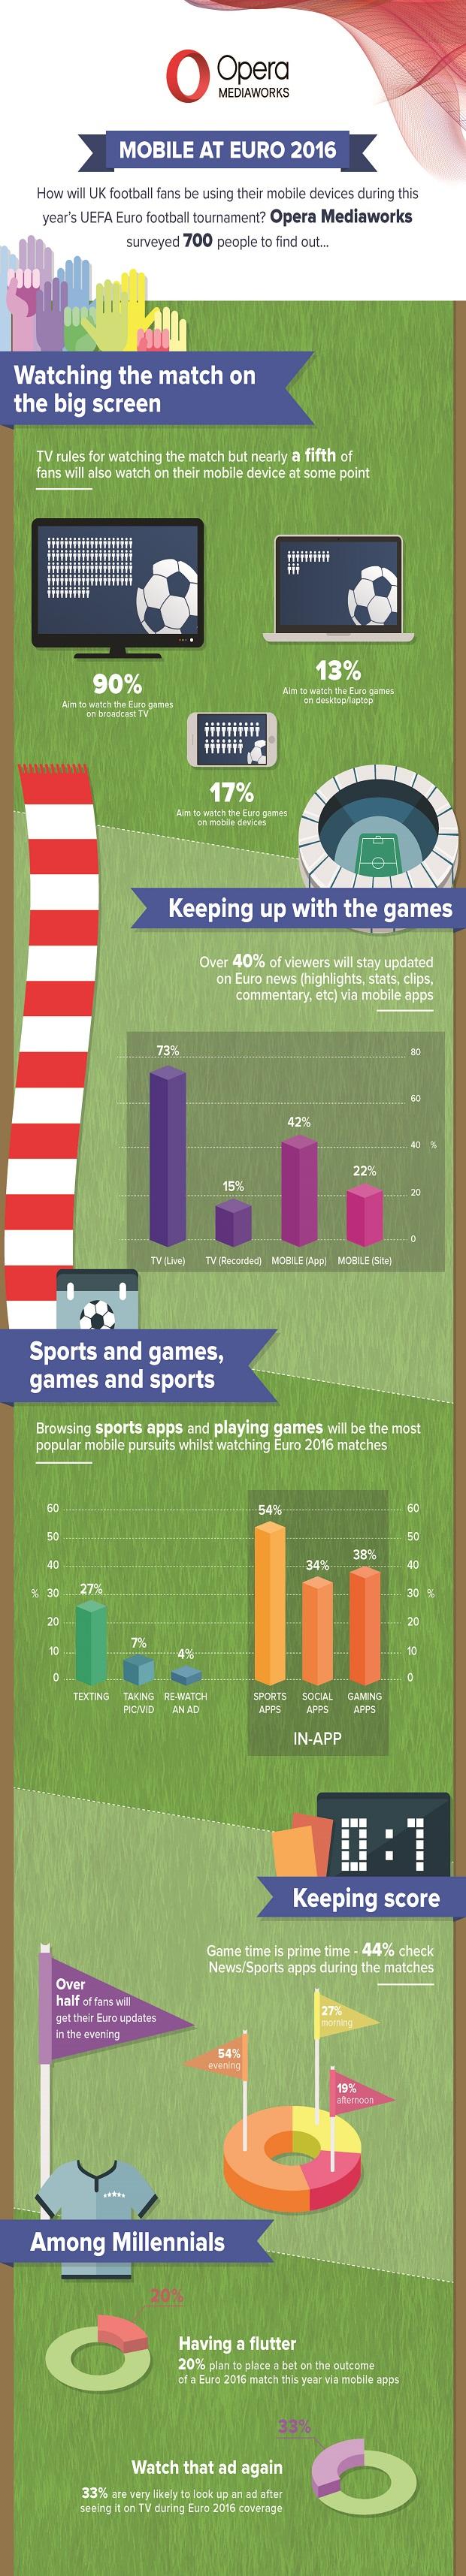 UEFA-infographic-UK.jpg